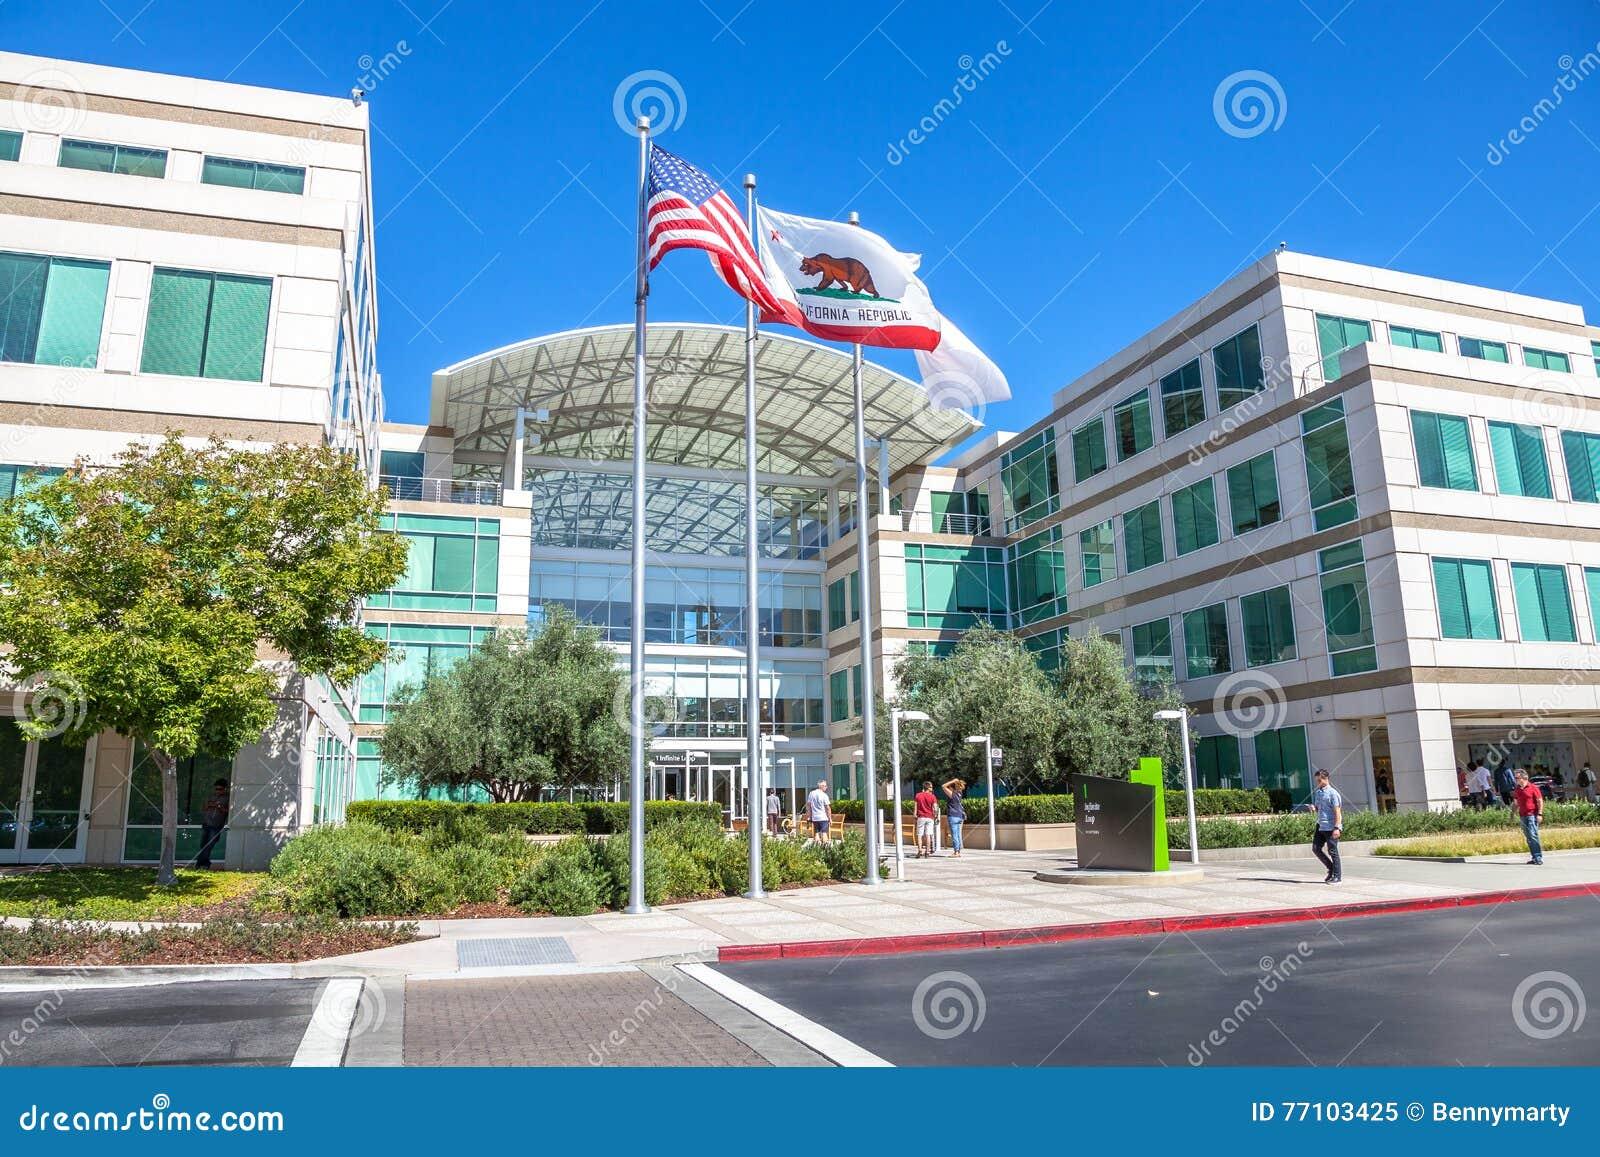 Apple Cupertino California editorial image  Image of